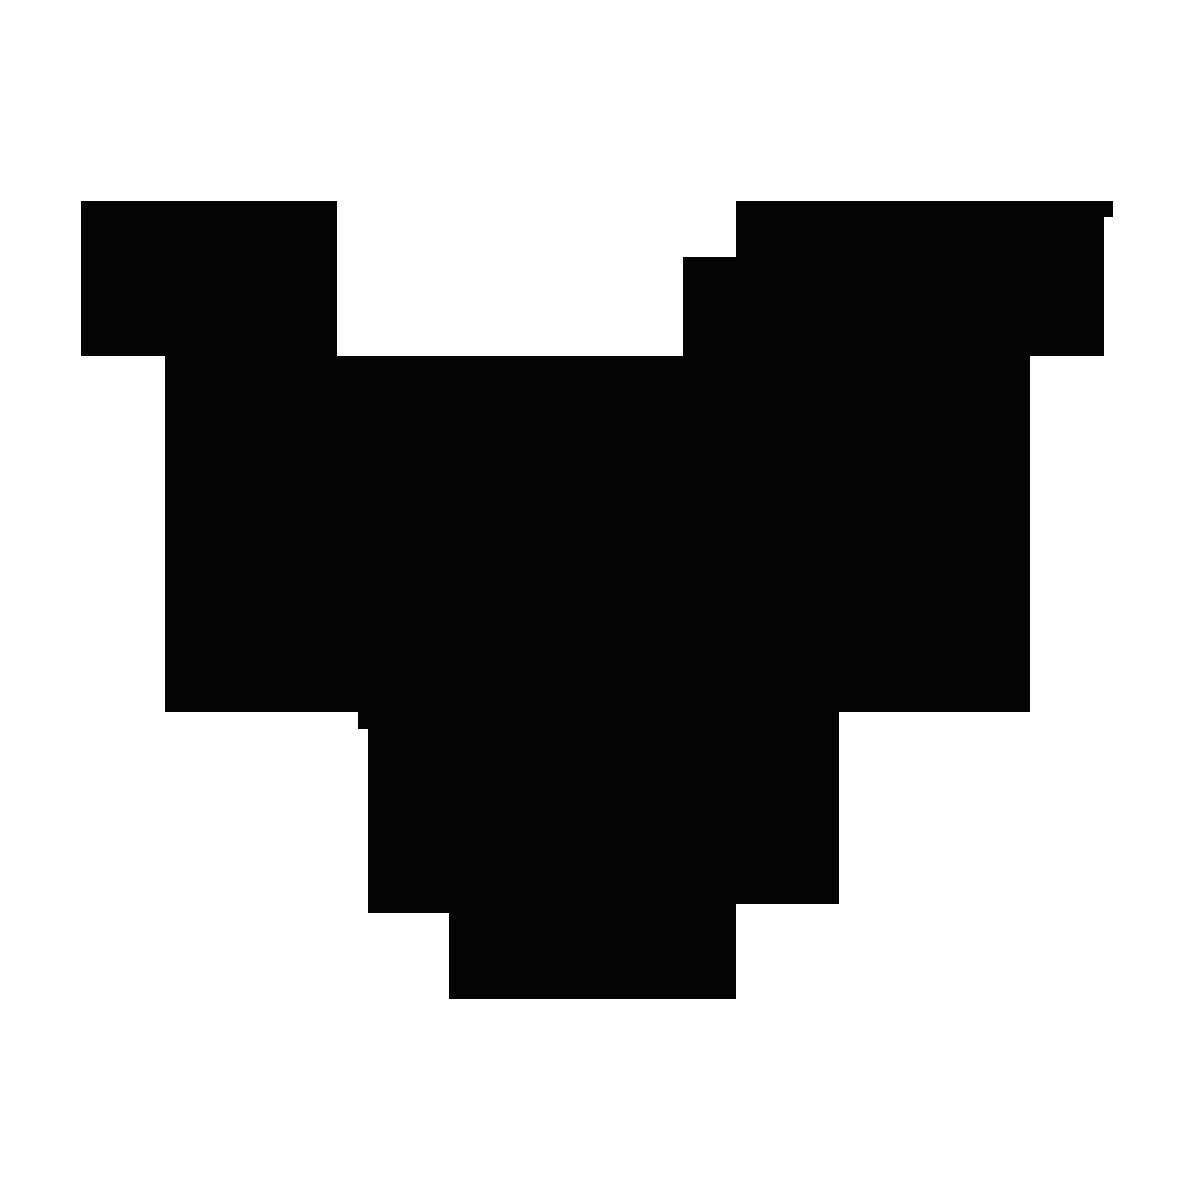 Version 5